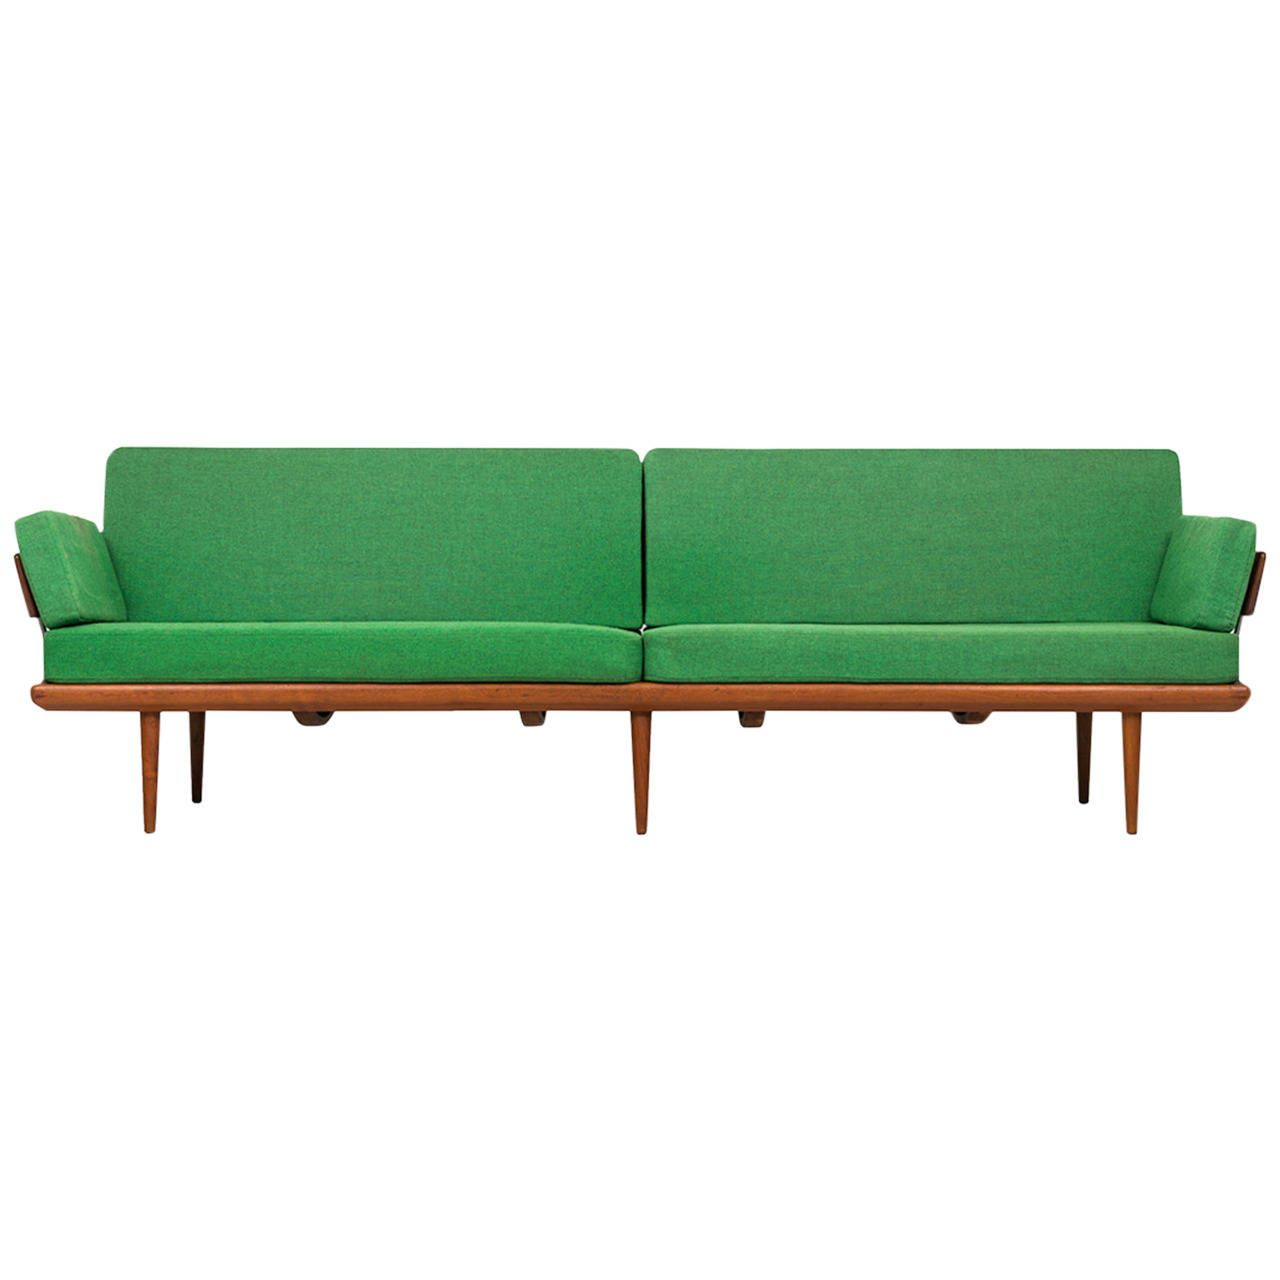 70 inch long sofa table vinyl cushion covers peter hvidt and orla mølgaard nielsen minerva